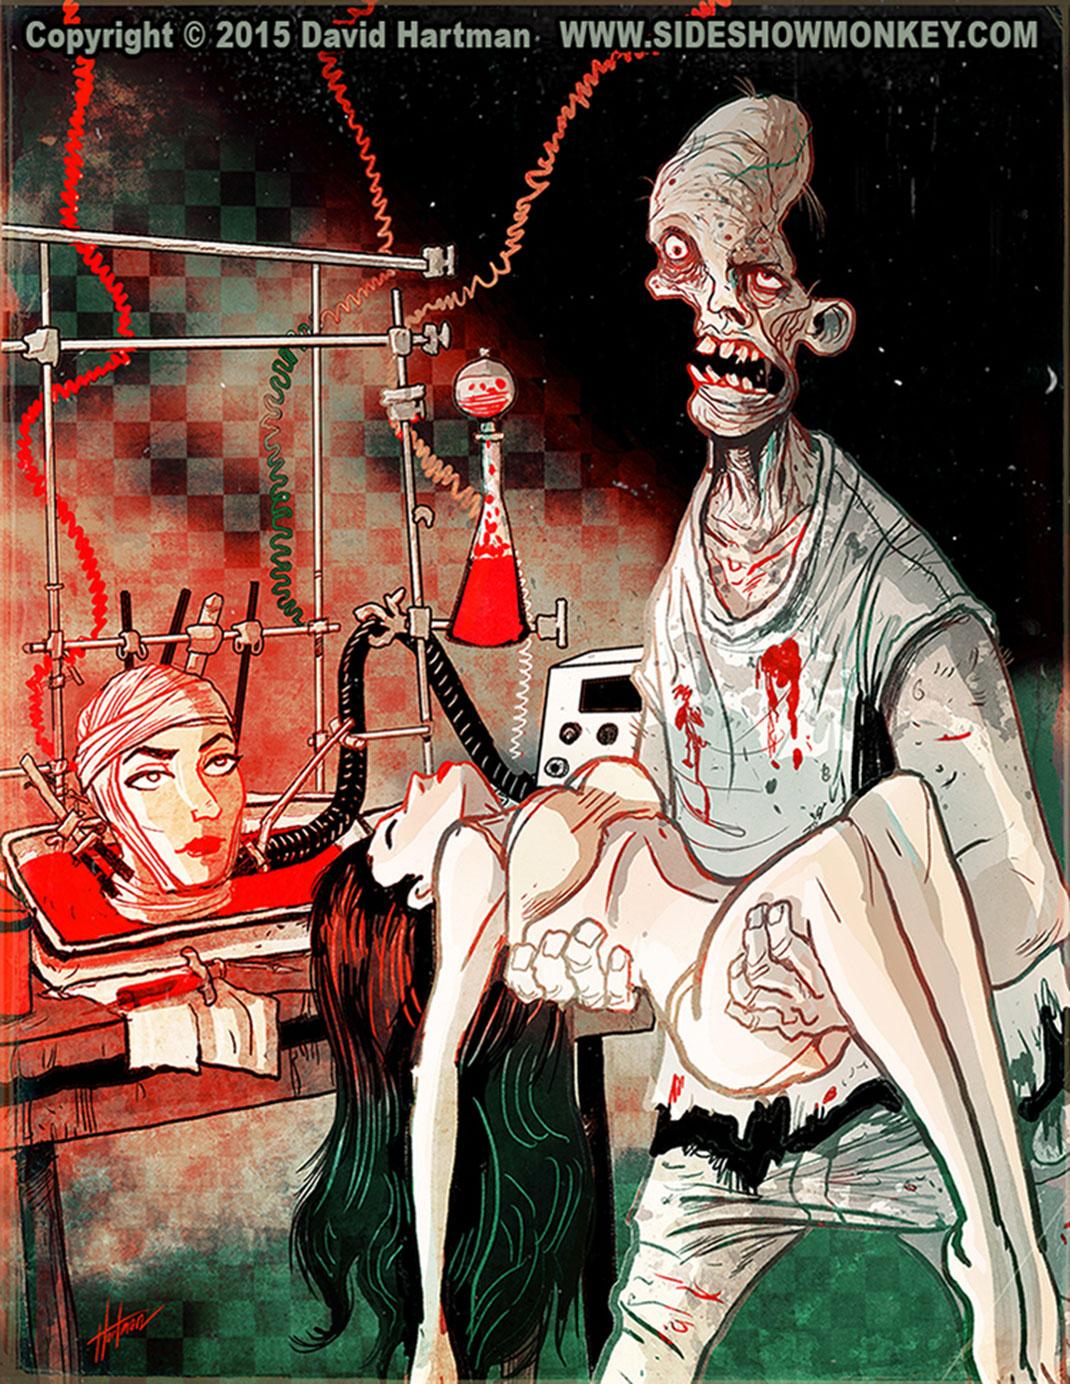 the_brain_that_wouldn_t_die_by_hartman_by_sideshowmonkey-d8ounvu